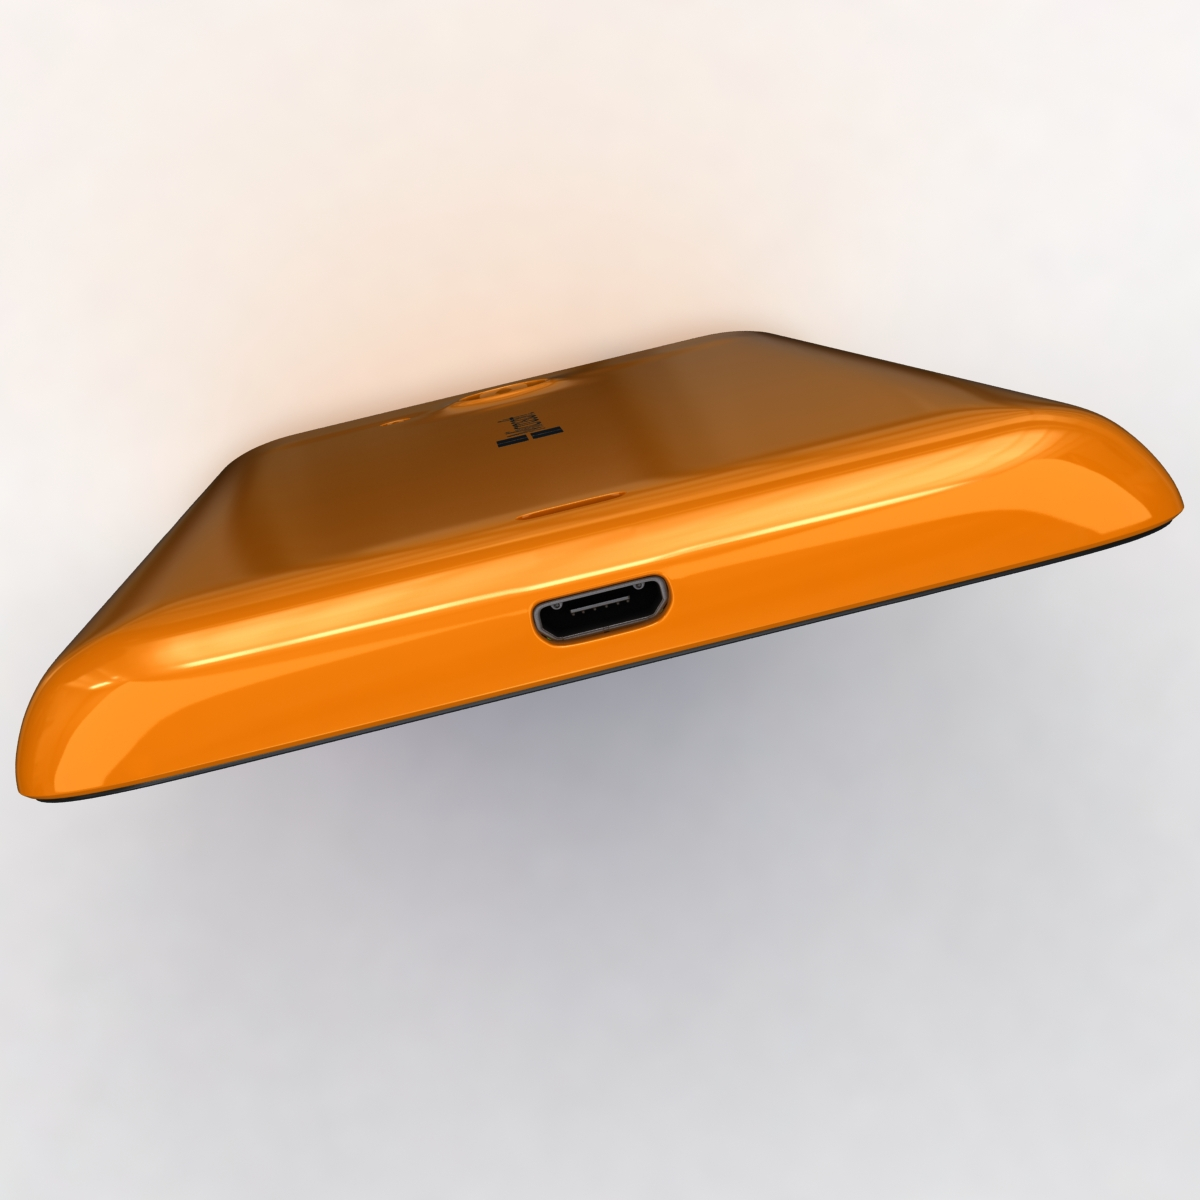 microsoft lumia 535 and dual sim orange 3d model 3ds max fbx c4d obj 204123